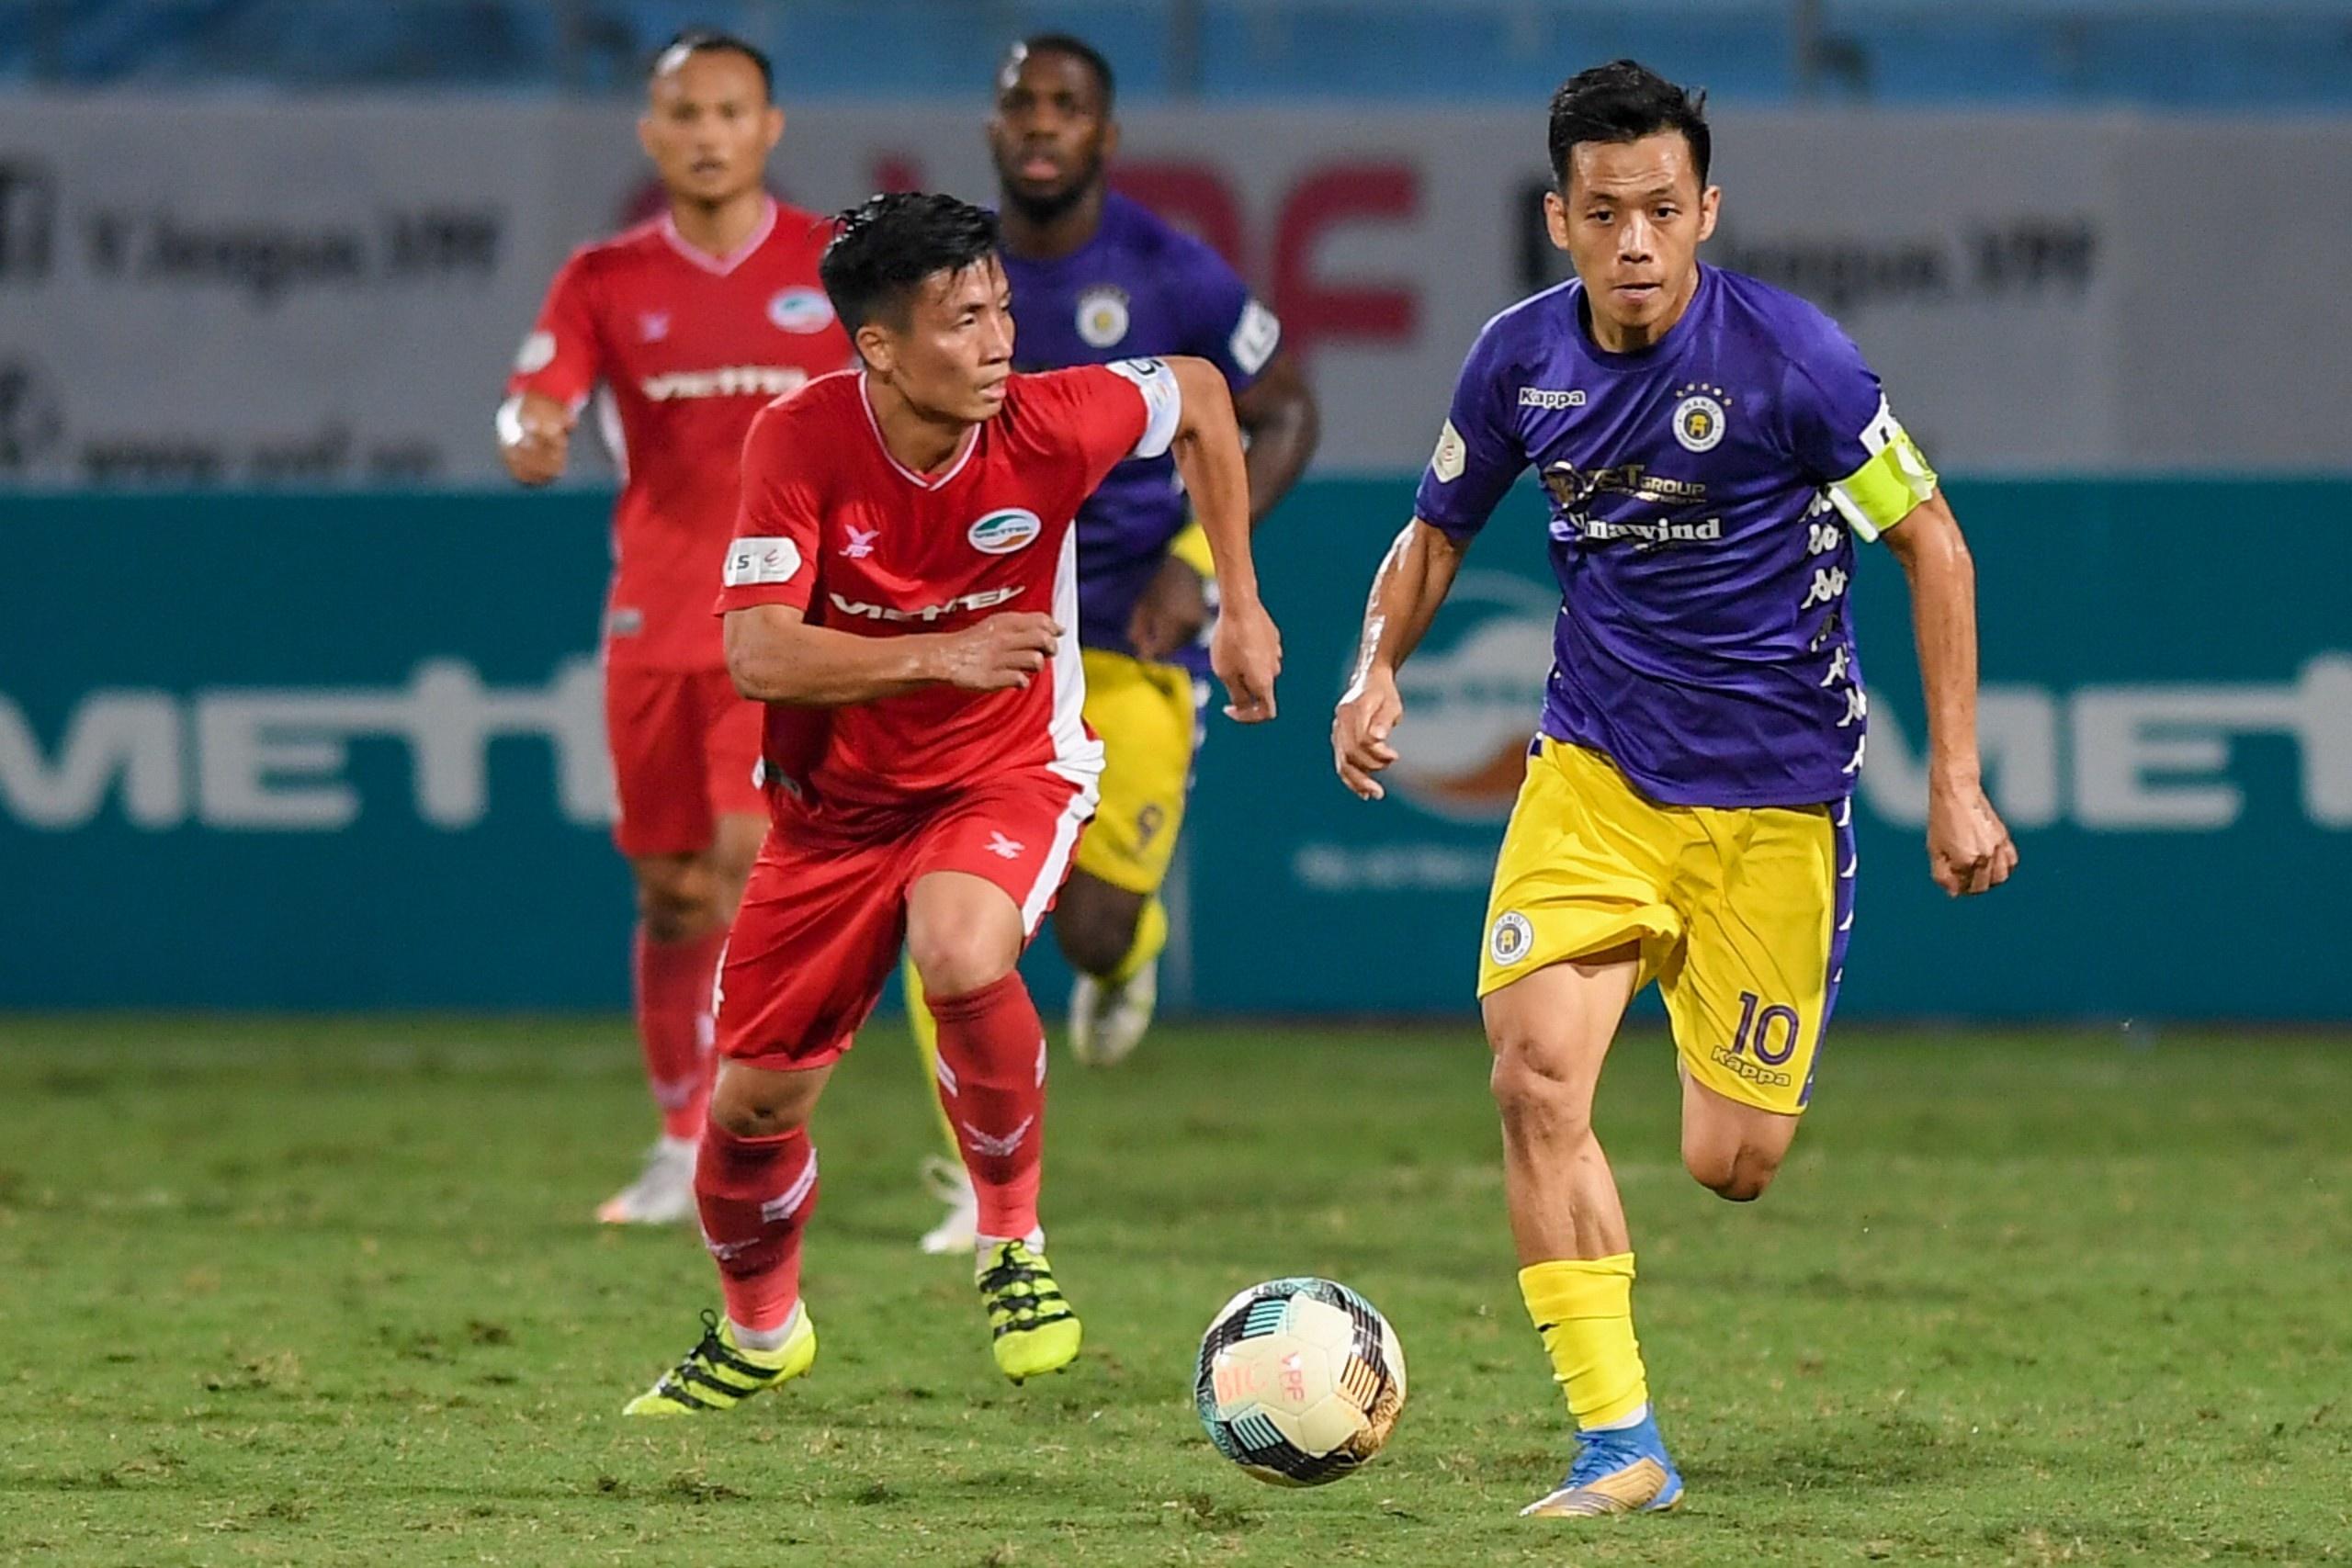 CLB Ha Noi vs Viettel anh 11